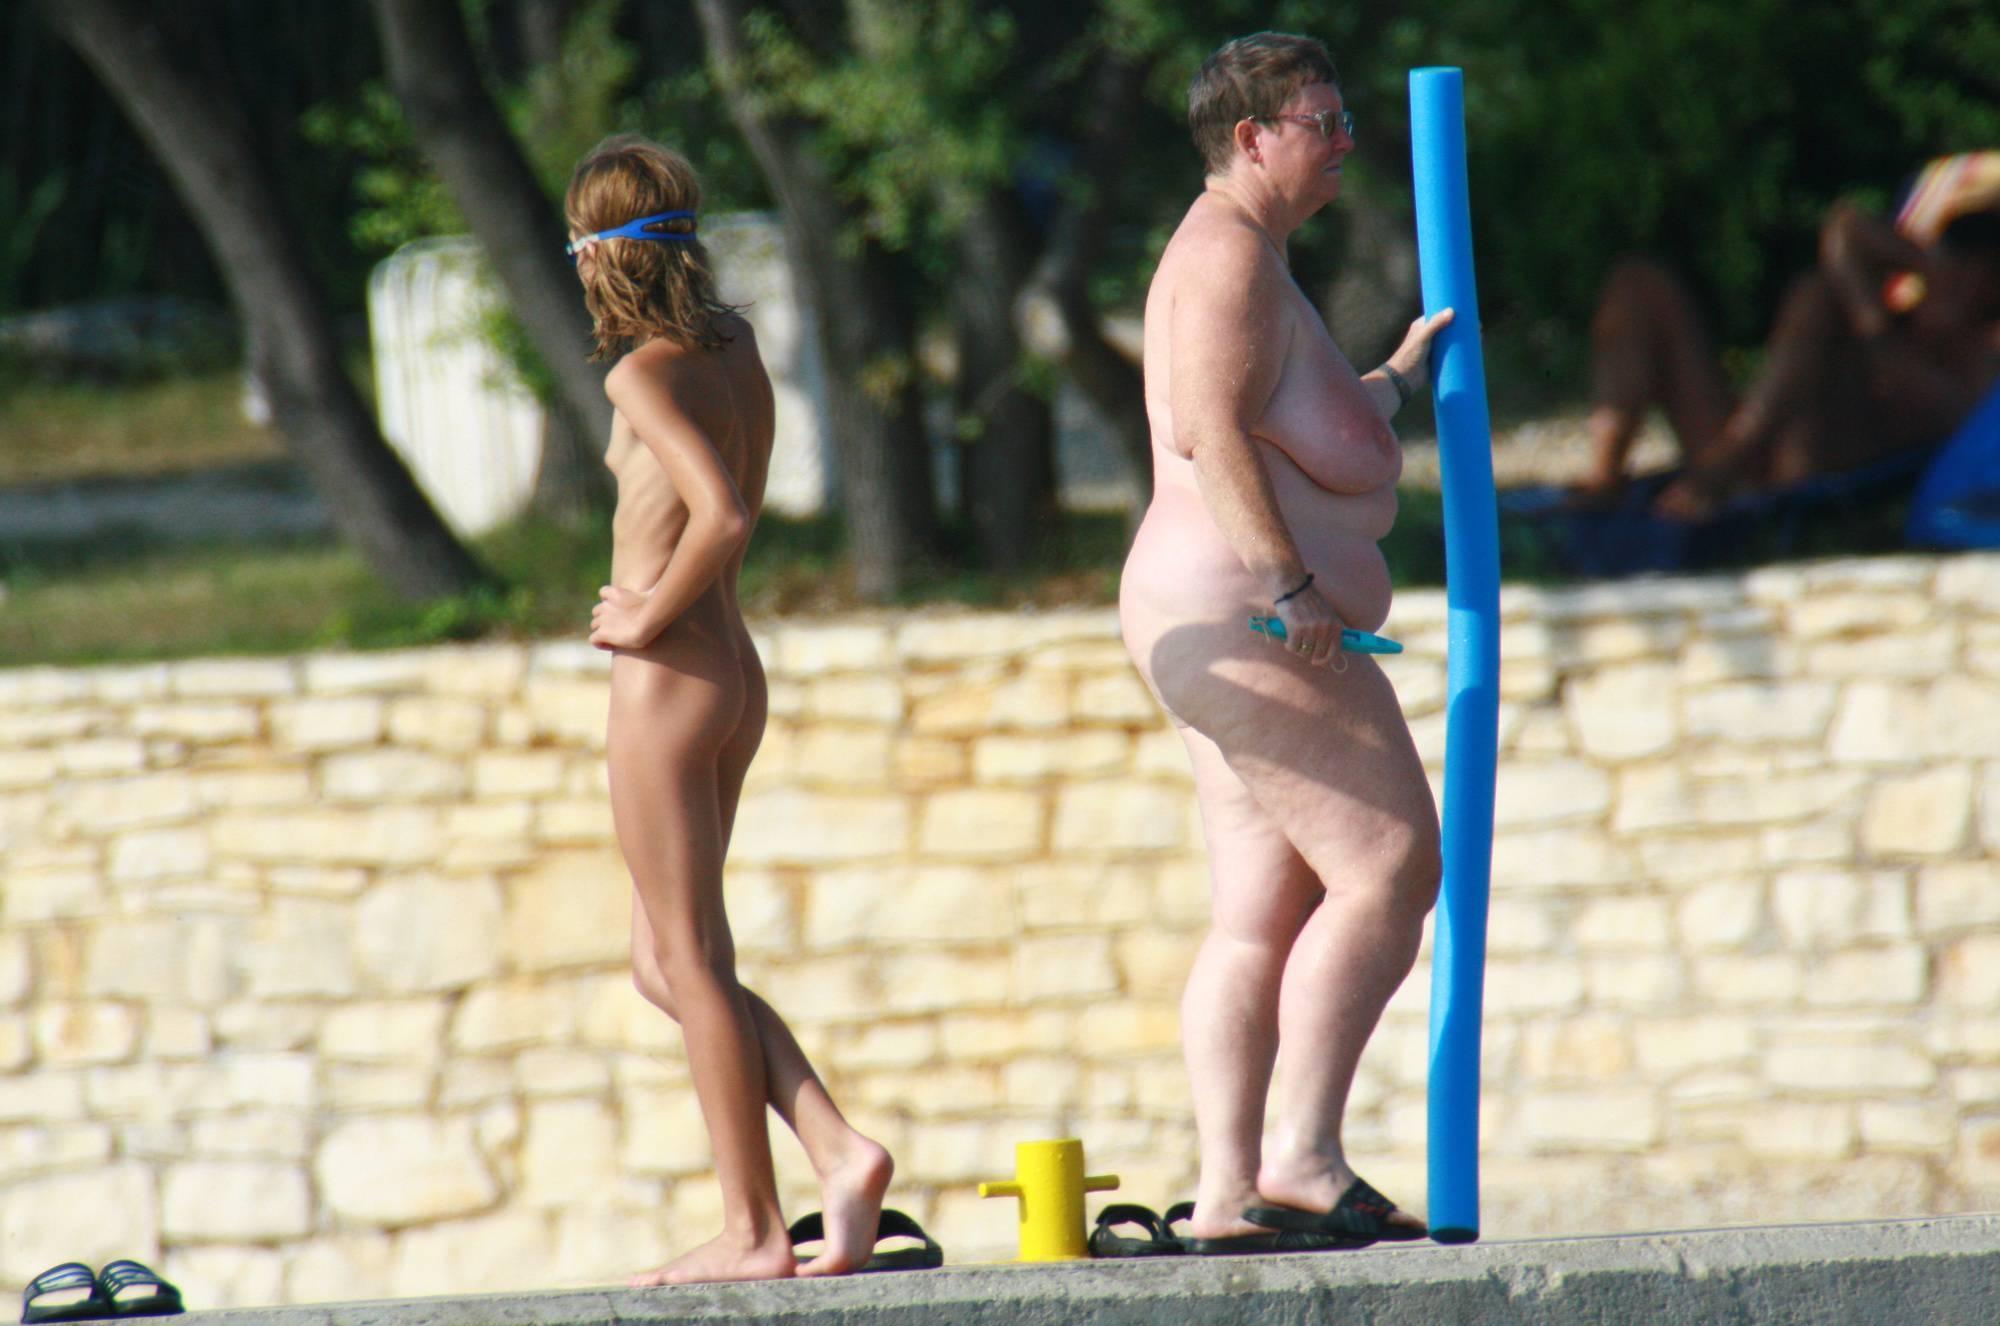 Purenudism Photos-Early Nudist Member Day - 3